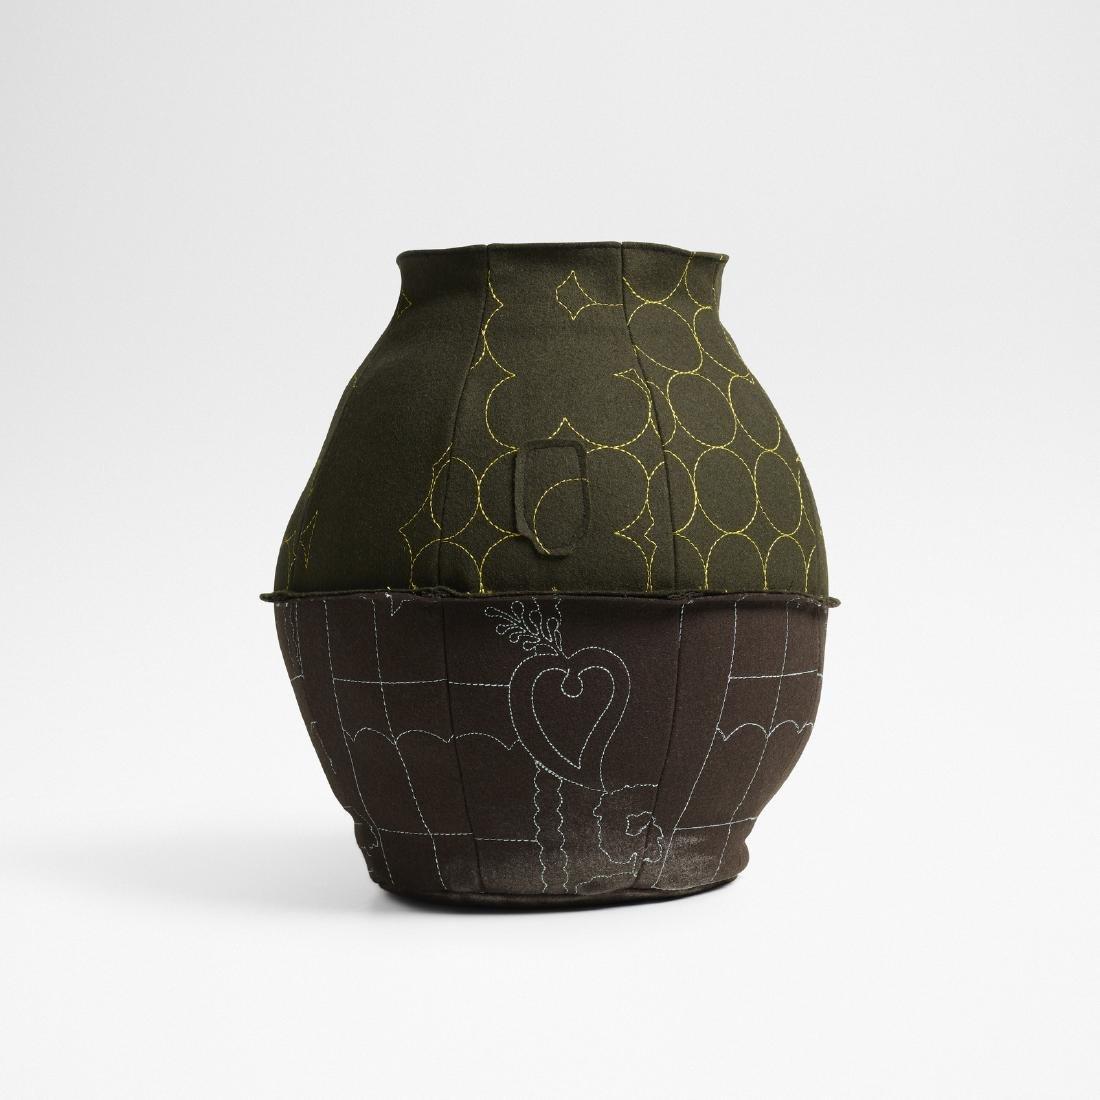 Hella Jongerius, Quilted vase